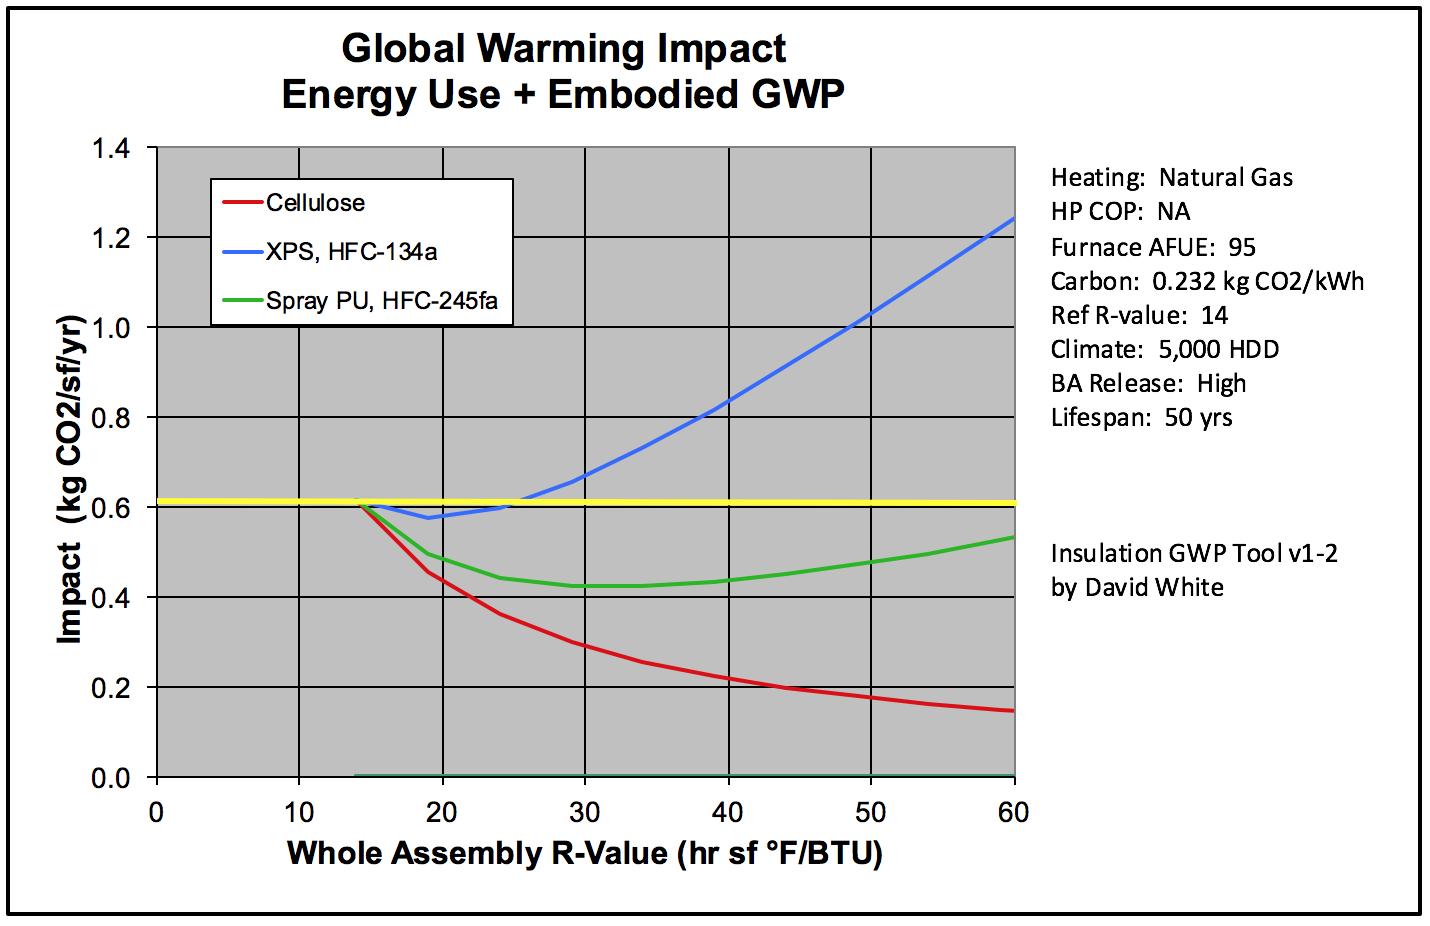 Global warming impact from David White's calculator, gas furnace